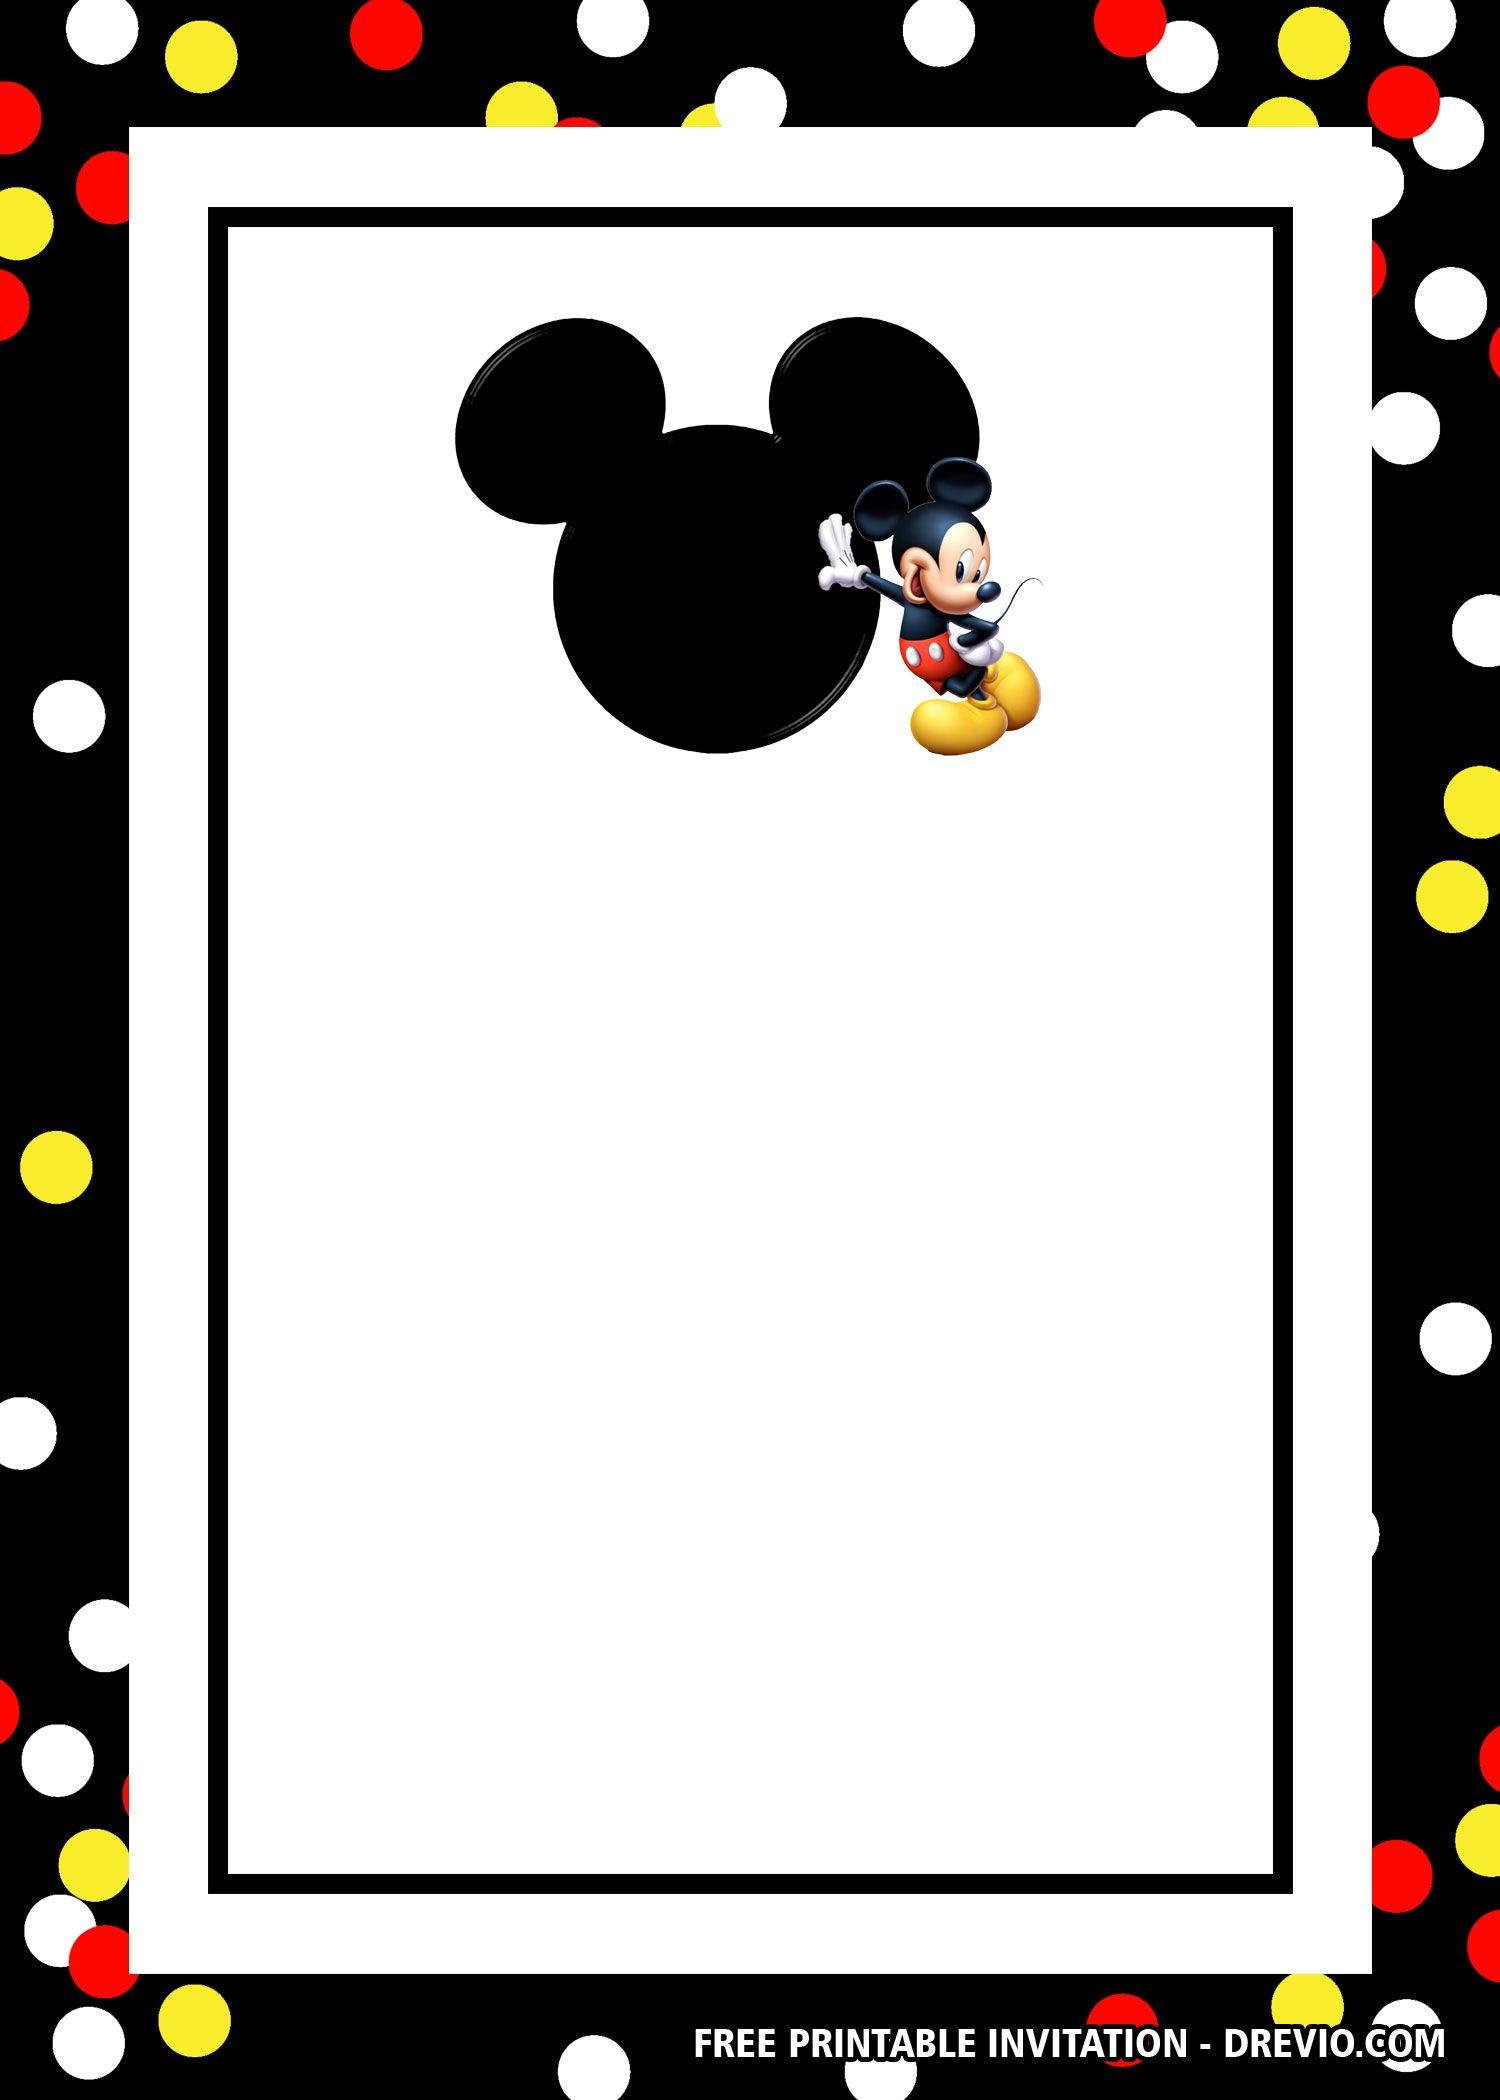 Free Mickey Mouse Head Invitation Templates Mickey Mouse Birthday Invitations Mickey Mouse Invitations Mickey Mouse Invitation